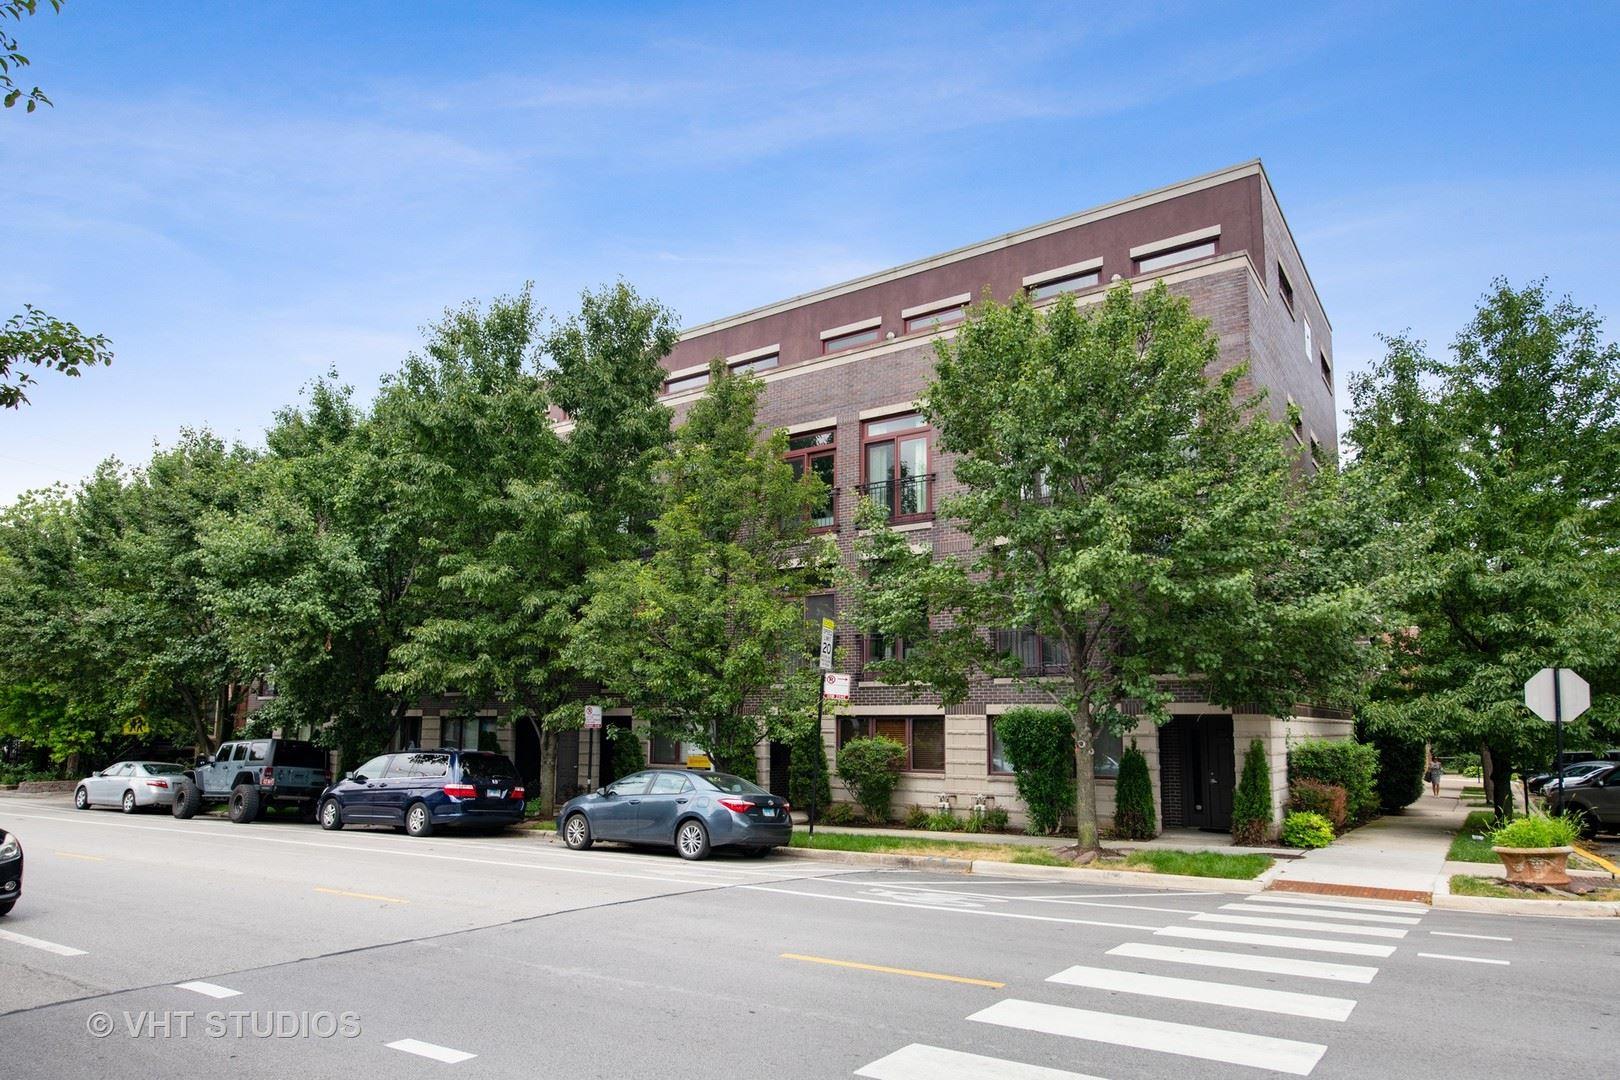 934 W Hubbard Street, Chicago, IL 60642 - #: 10795069